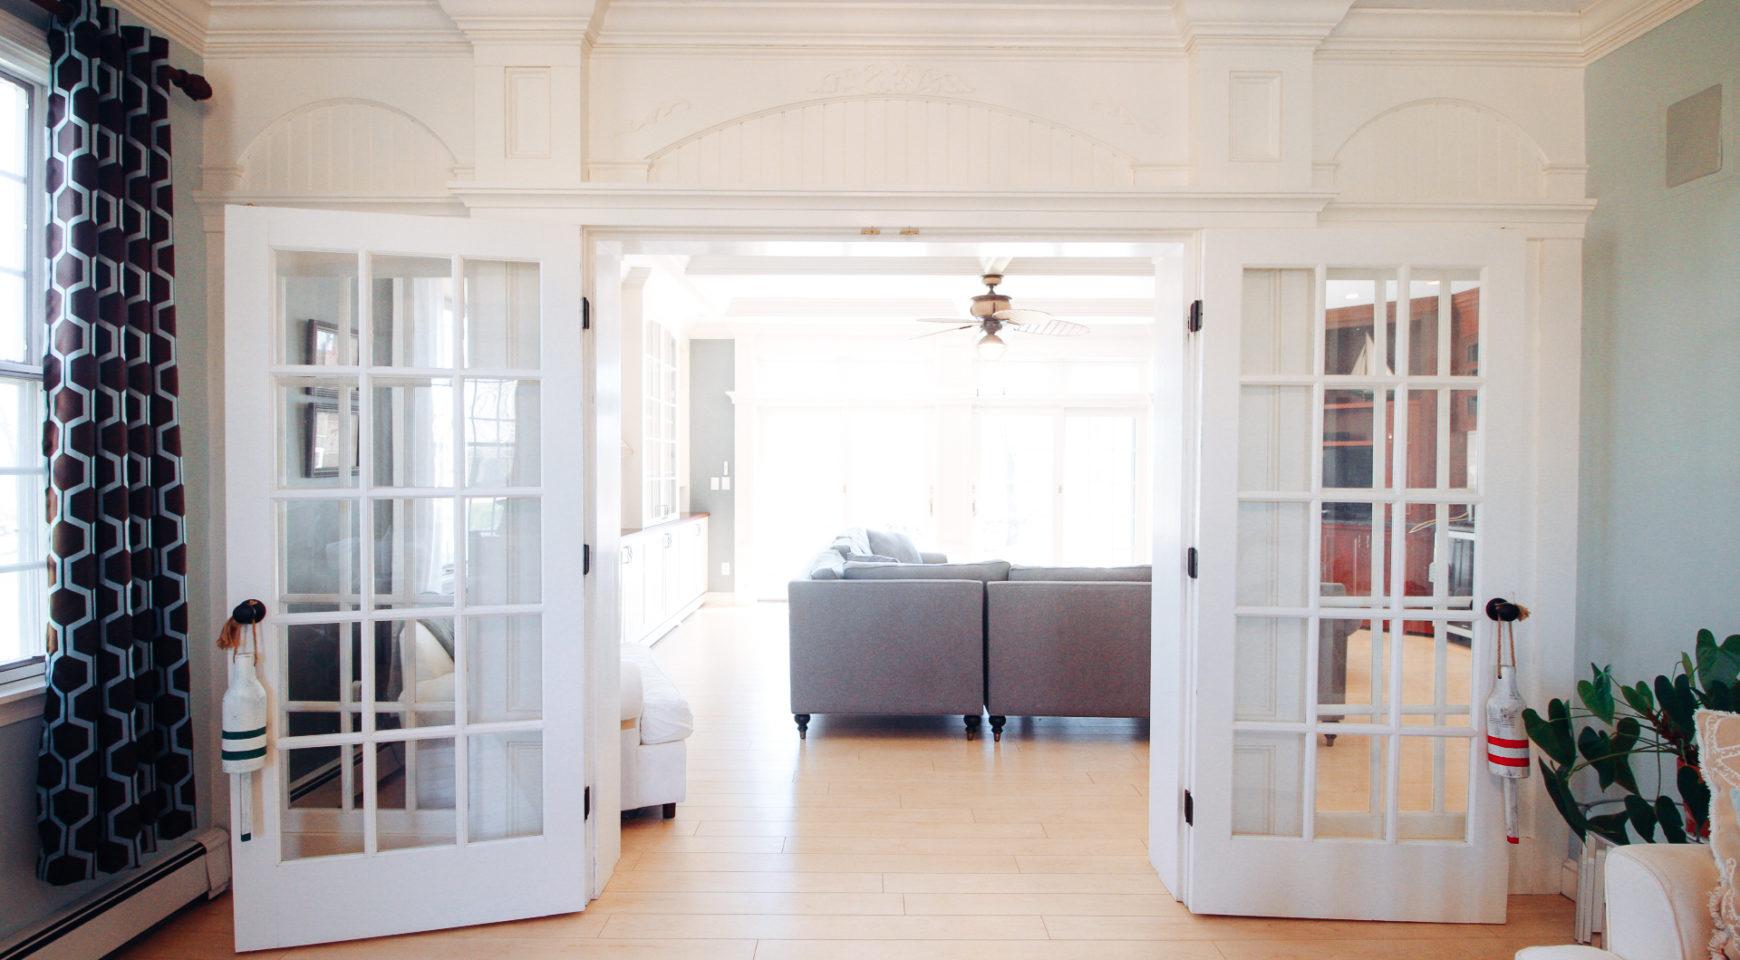 Luxe_and_Livable_Interior_Design_Blog_by_Maloney_Interiors_Newport_Rhode_Island_Fitzpatrick_Team_Remax_05.jpg